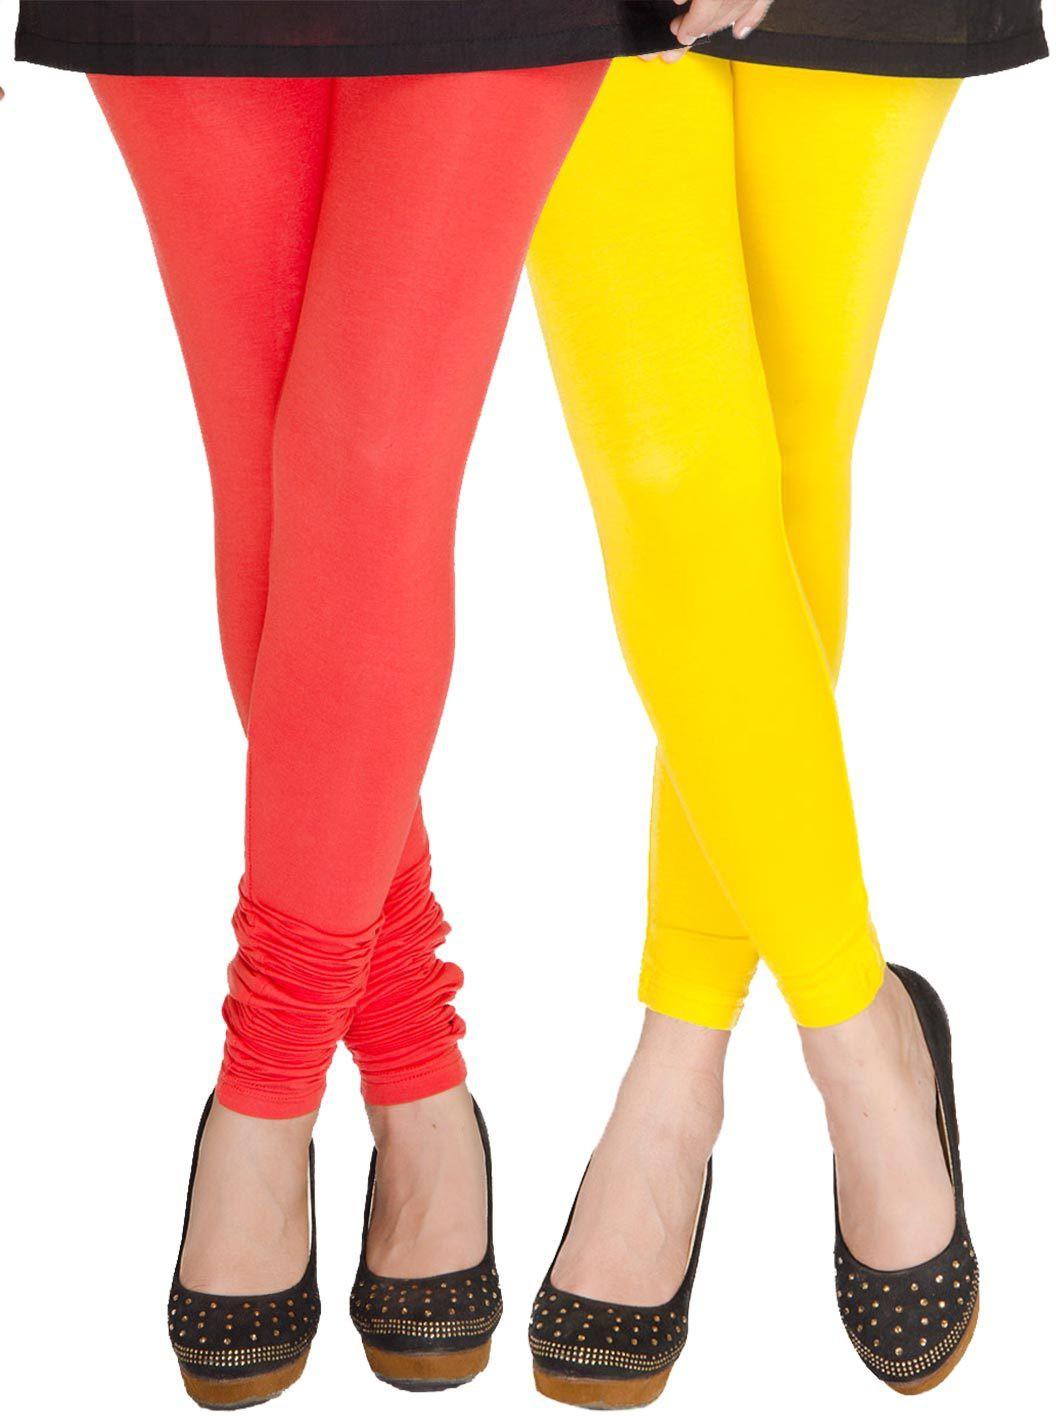 Medoo Womens Red, Yellow Leggings(Pack of 2)